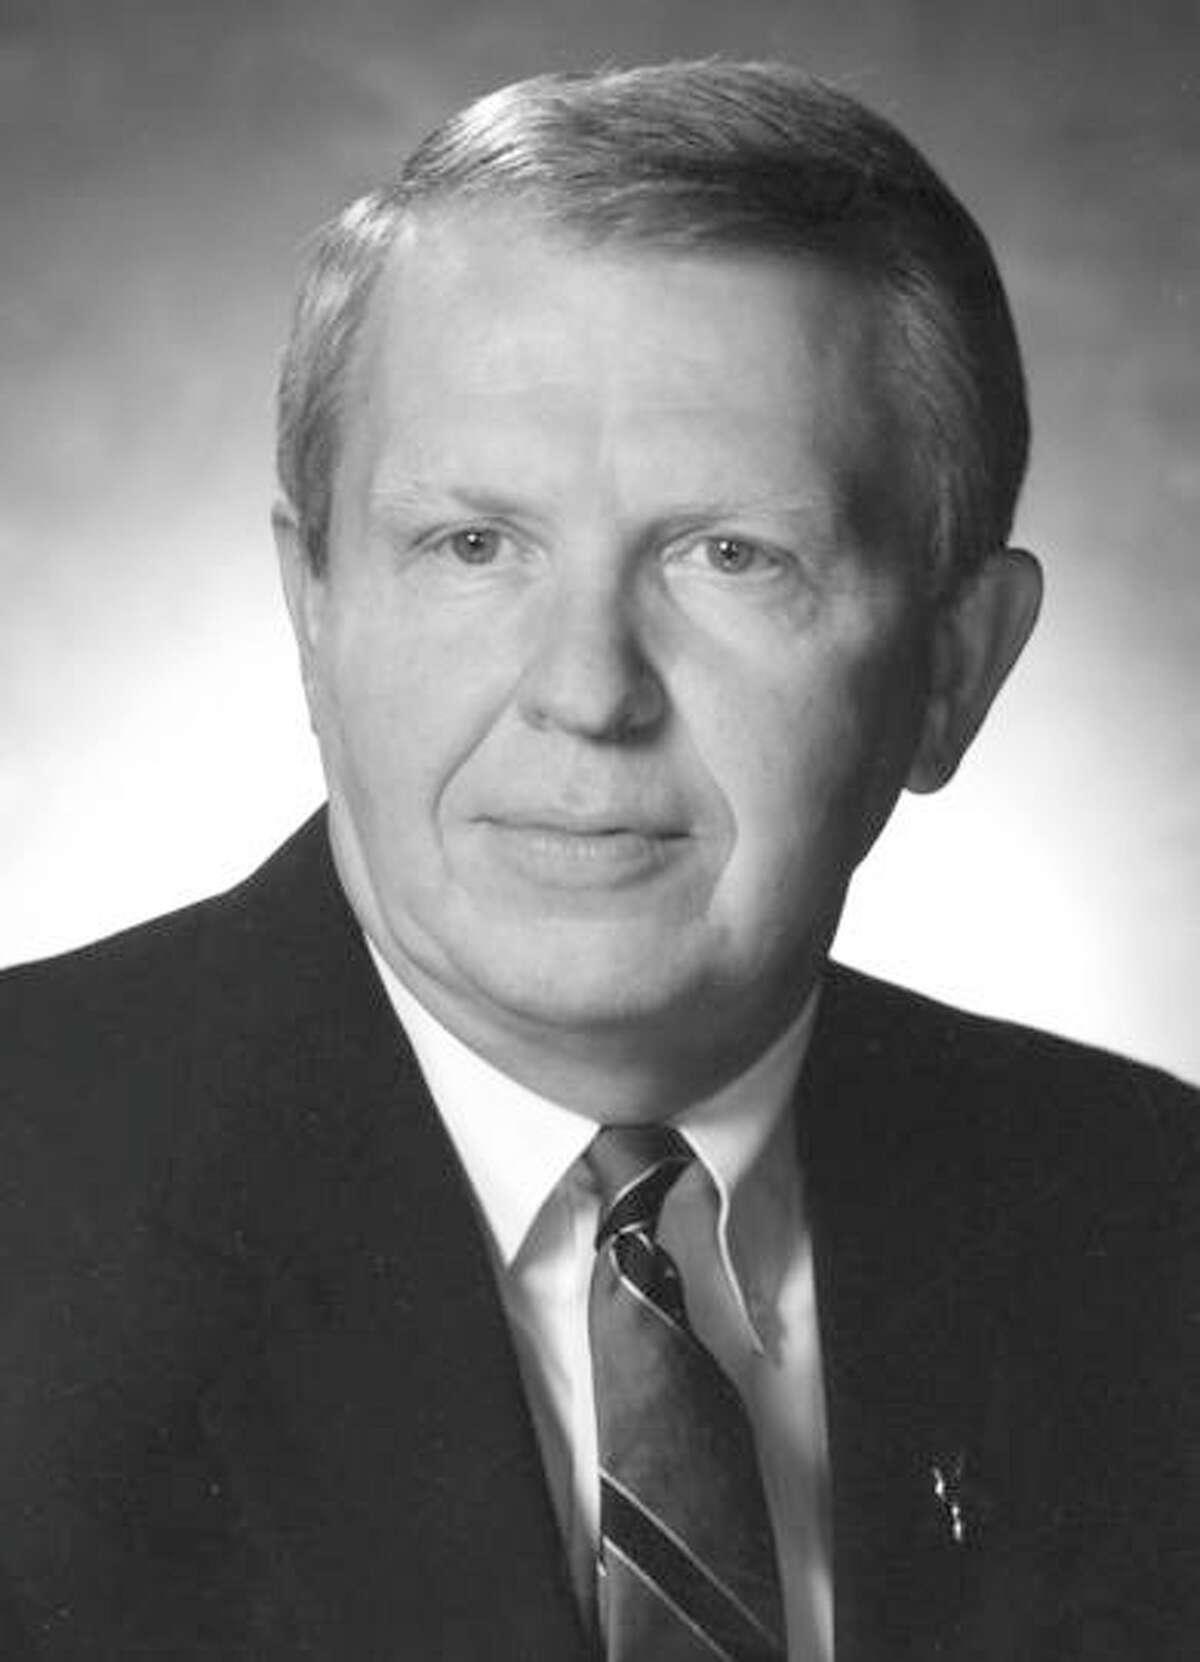 Former Spring ISD Superintendent Gordon M. Anderson